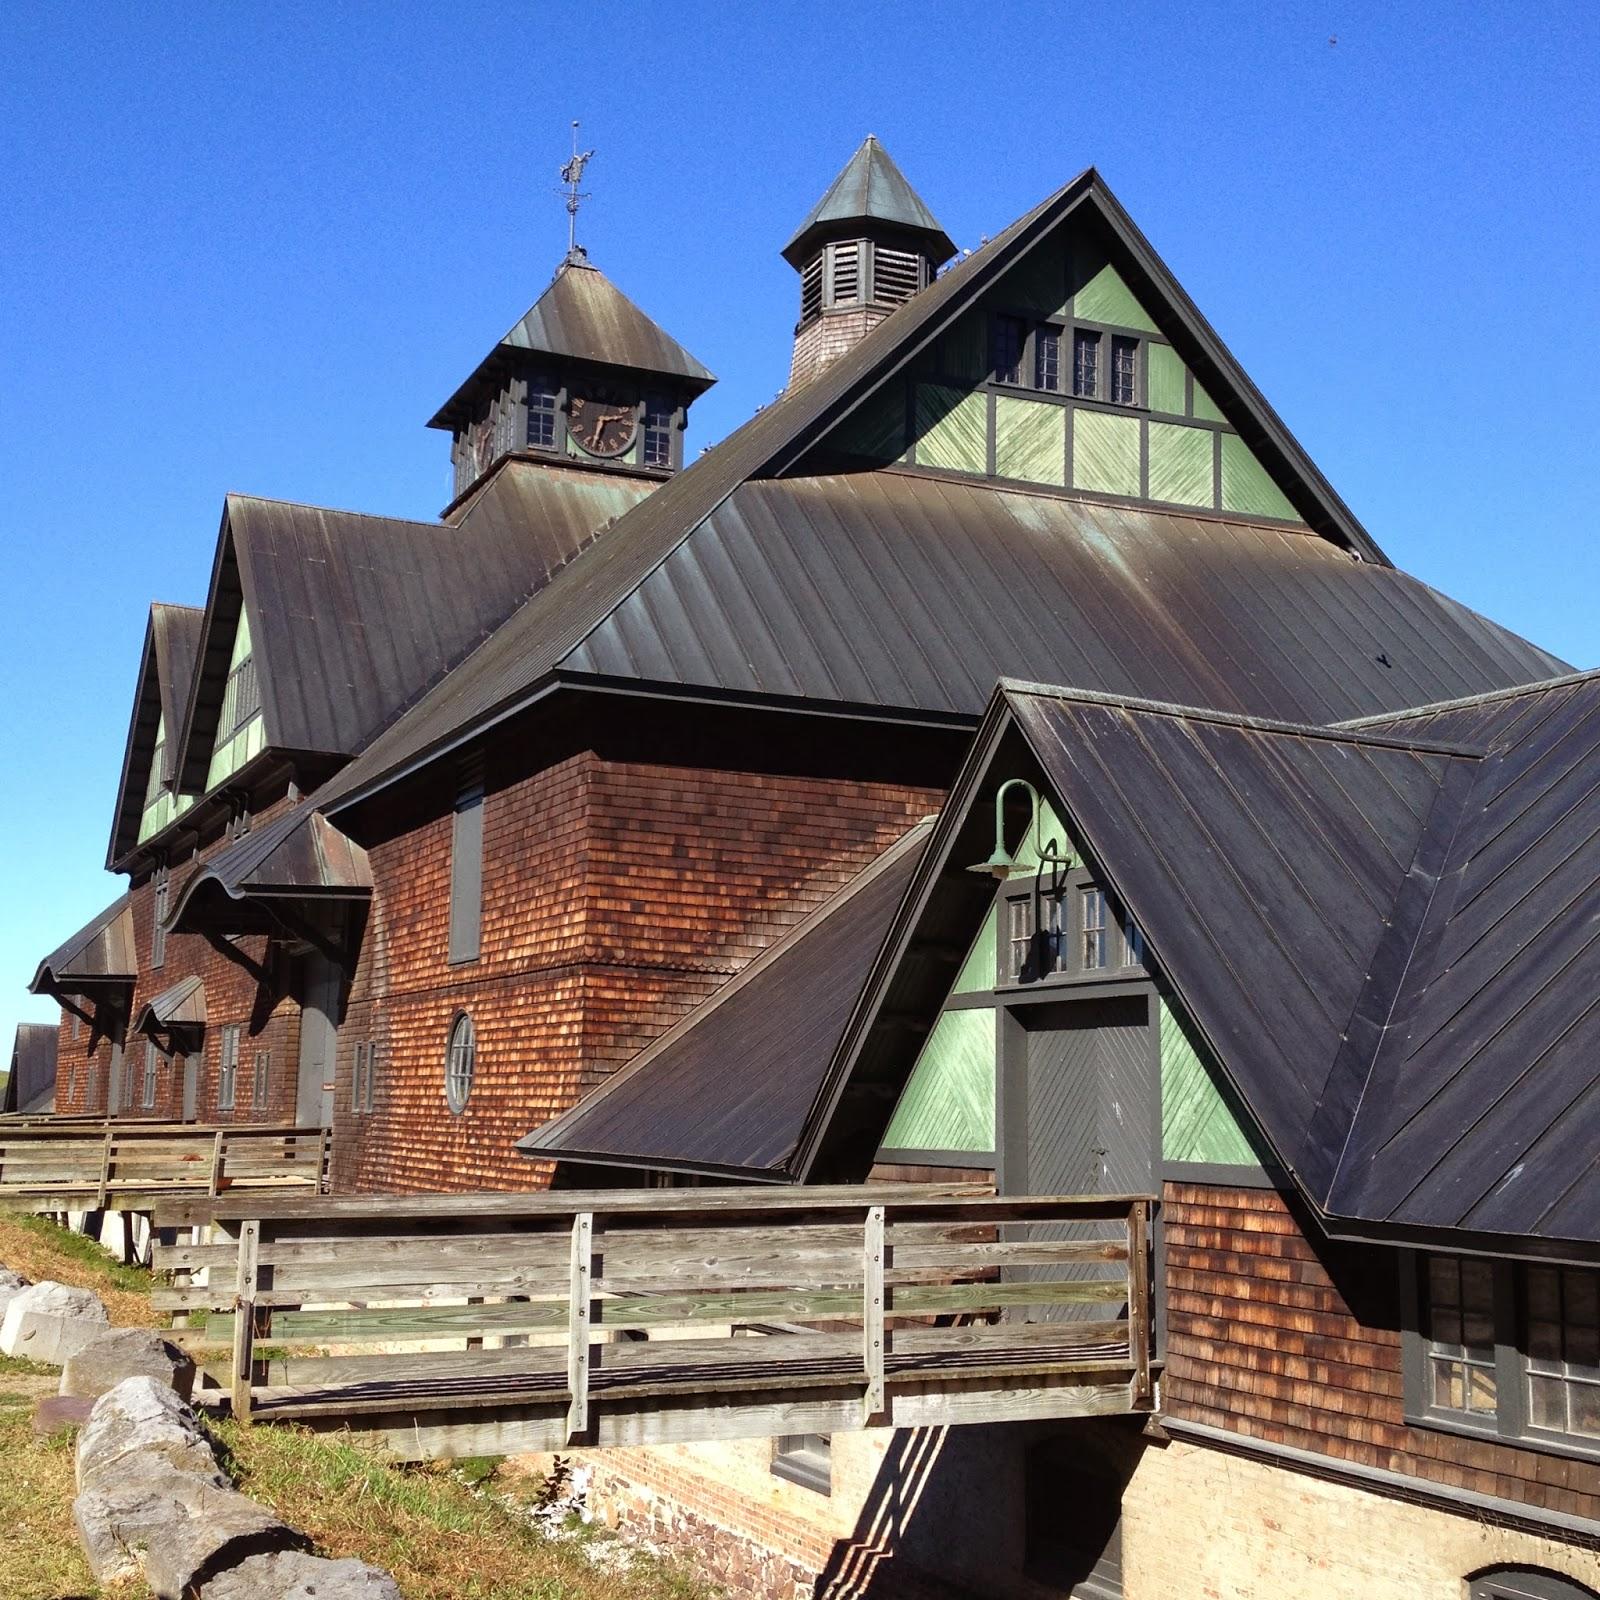 The Polohouse: Vermont Views